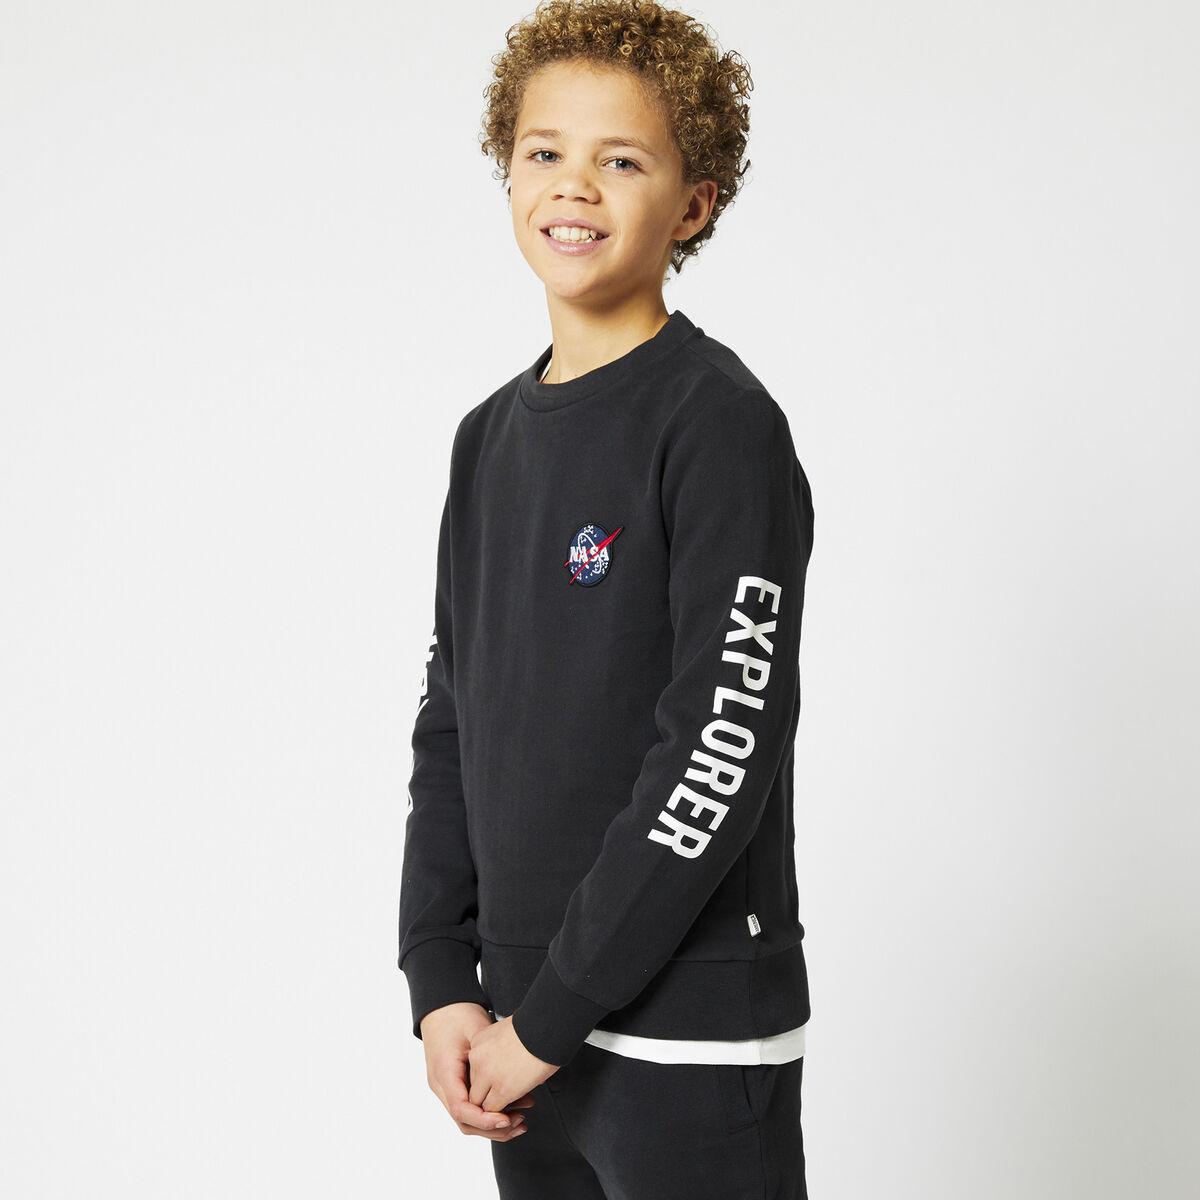 Sweater Soren Jr